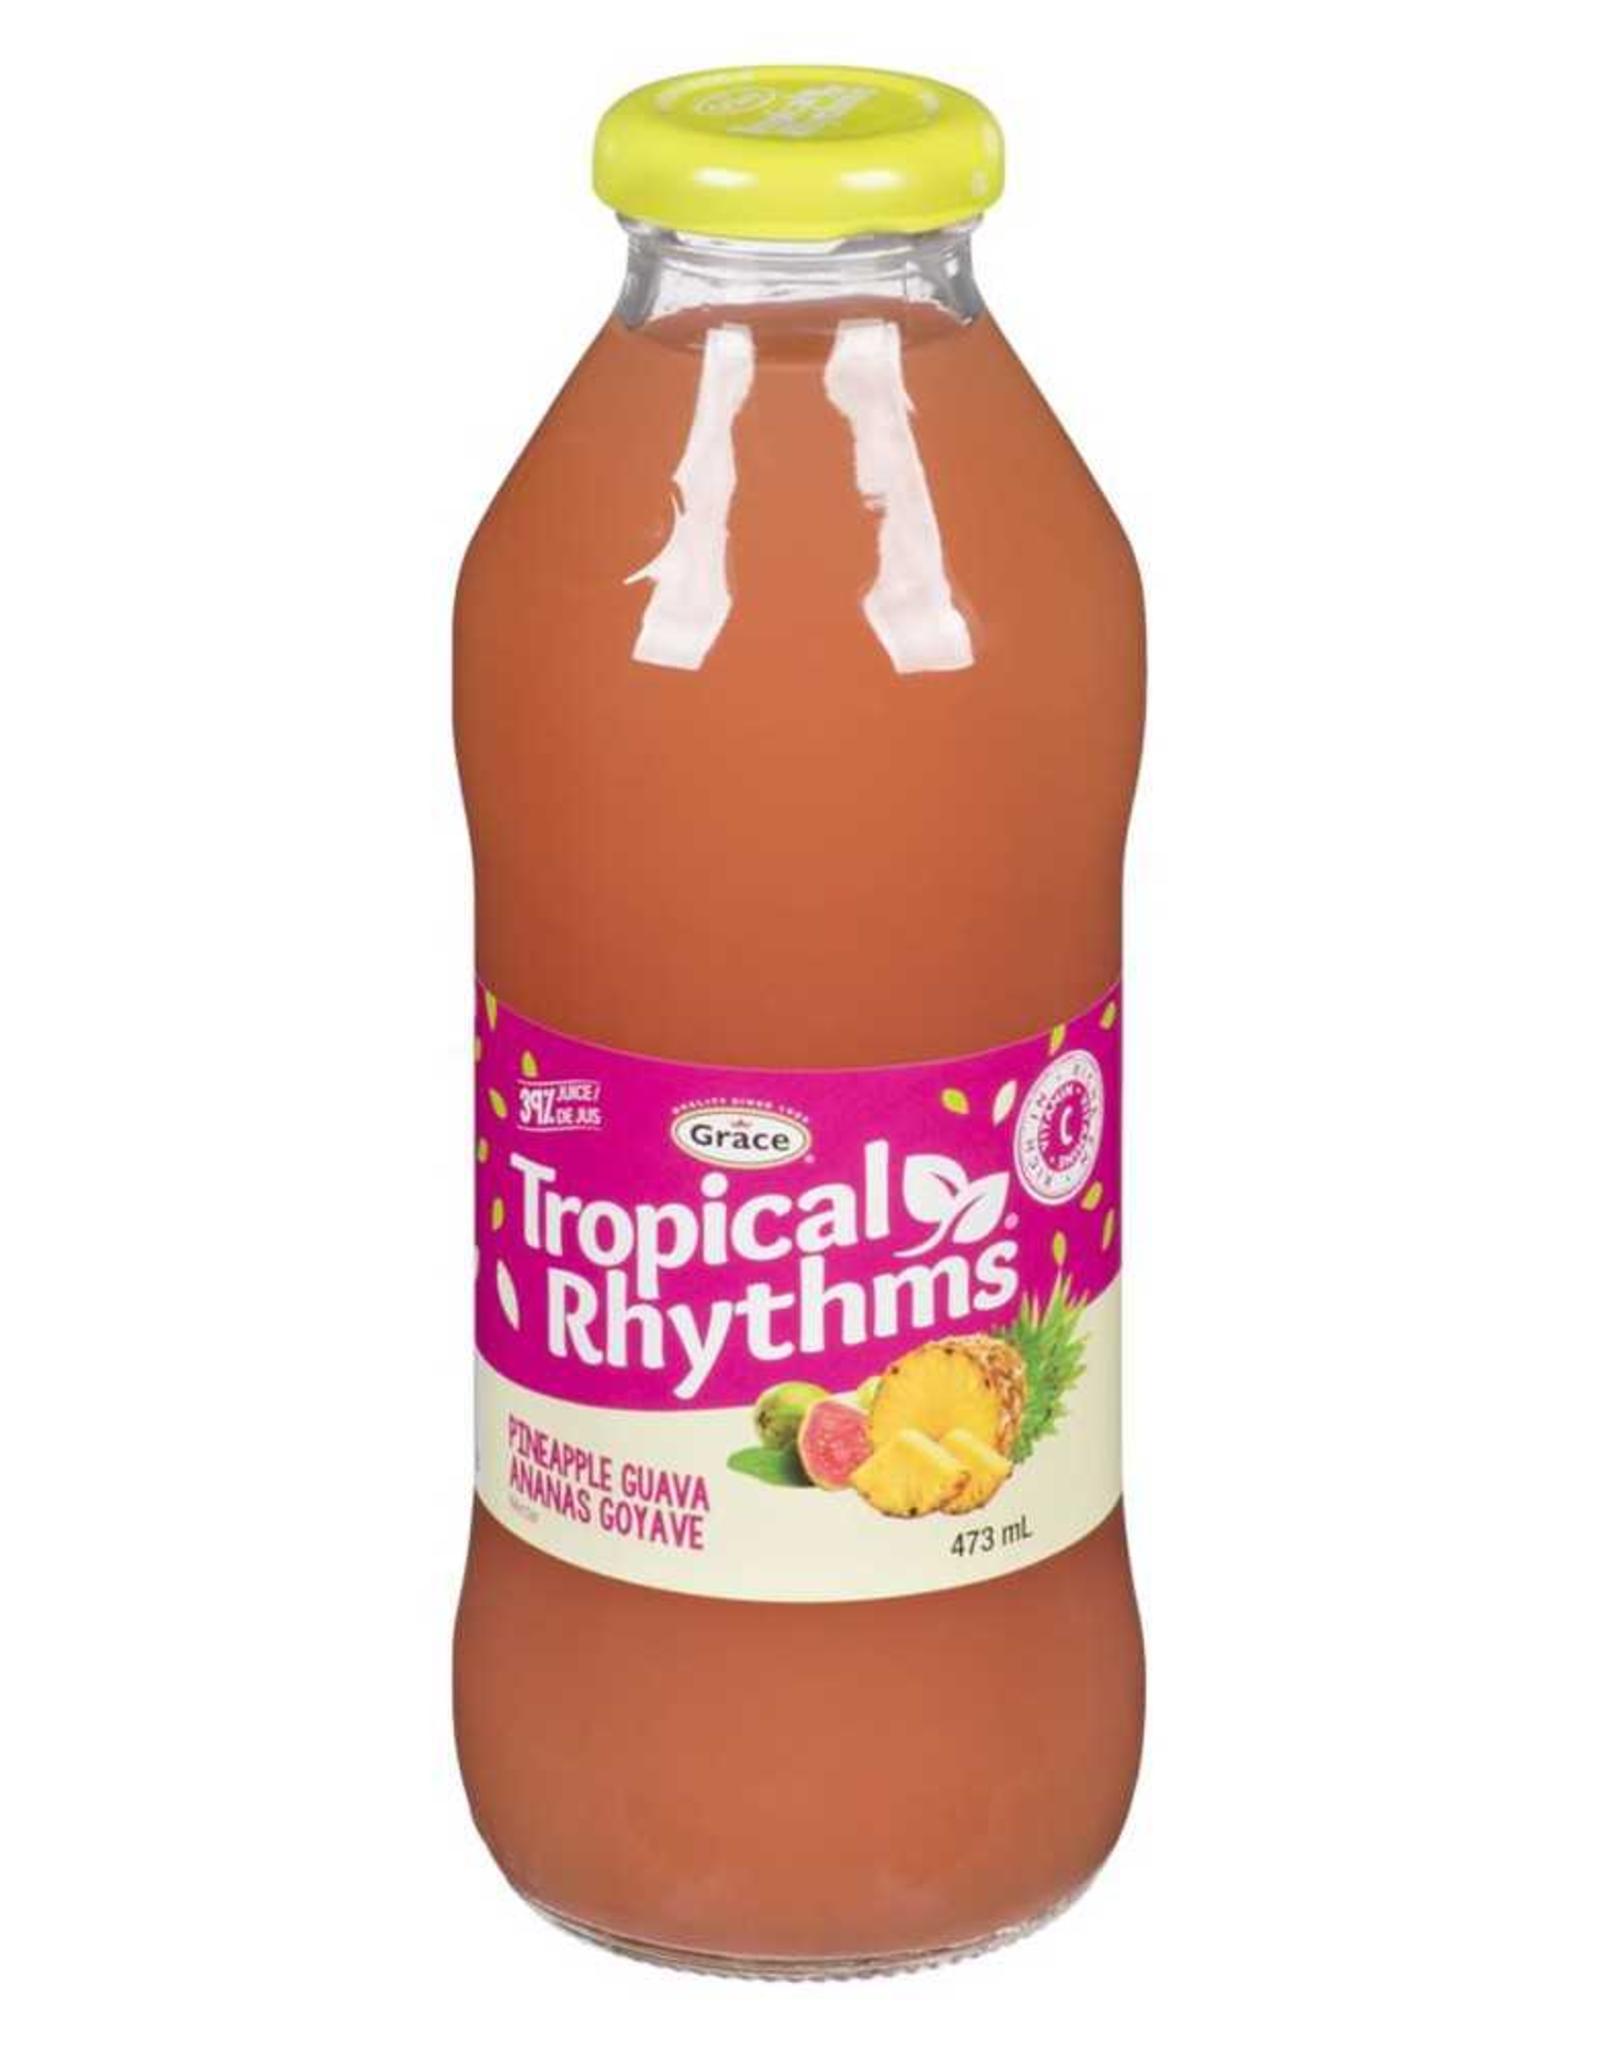 Grace Rhythm Pineapple/Guava